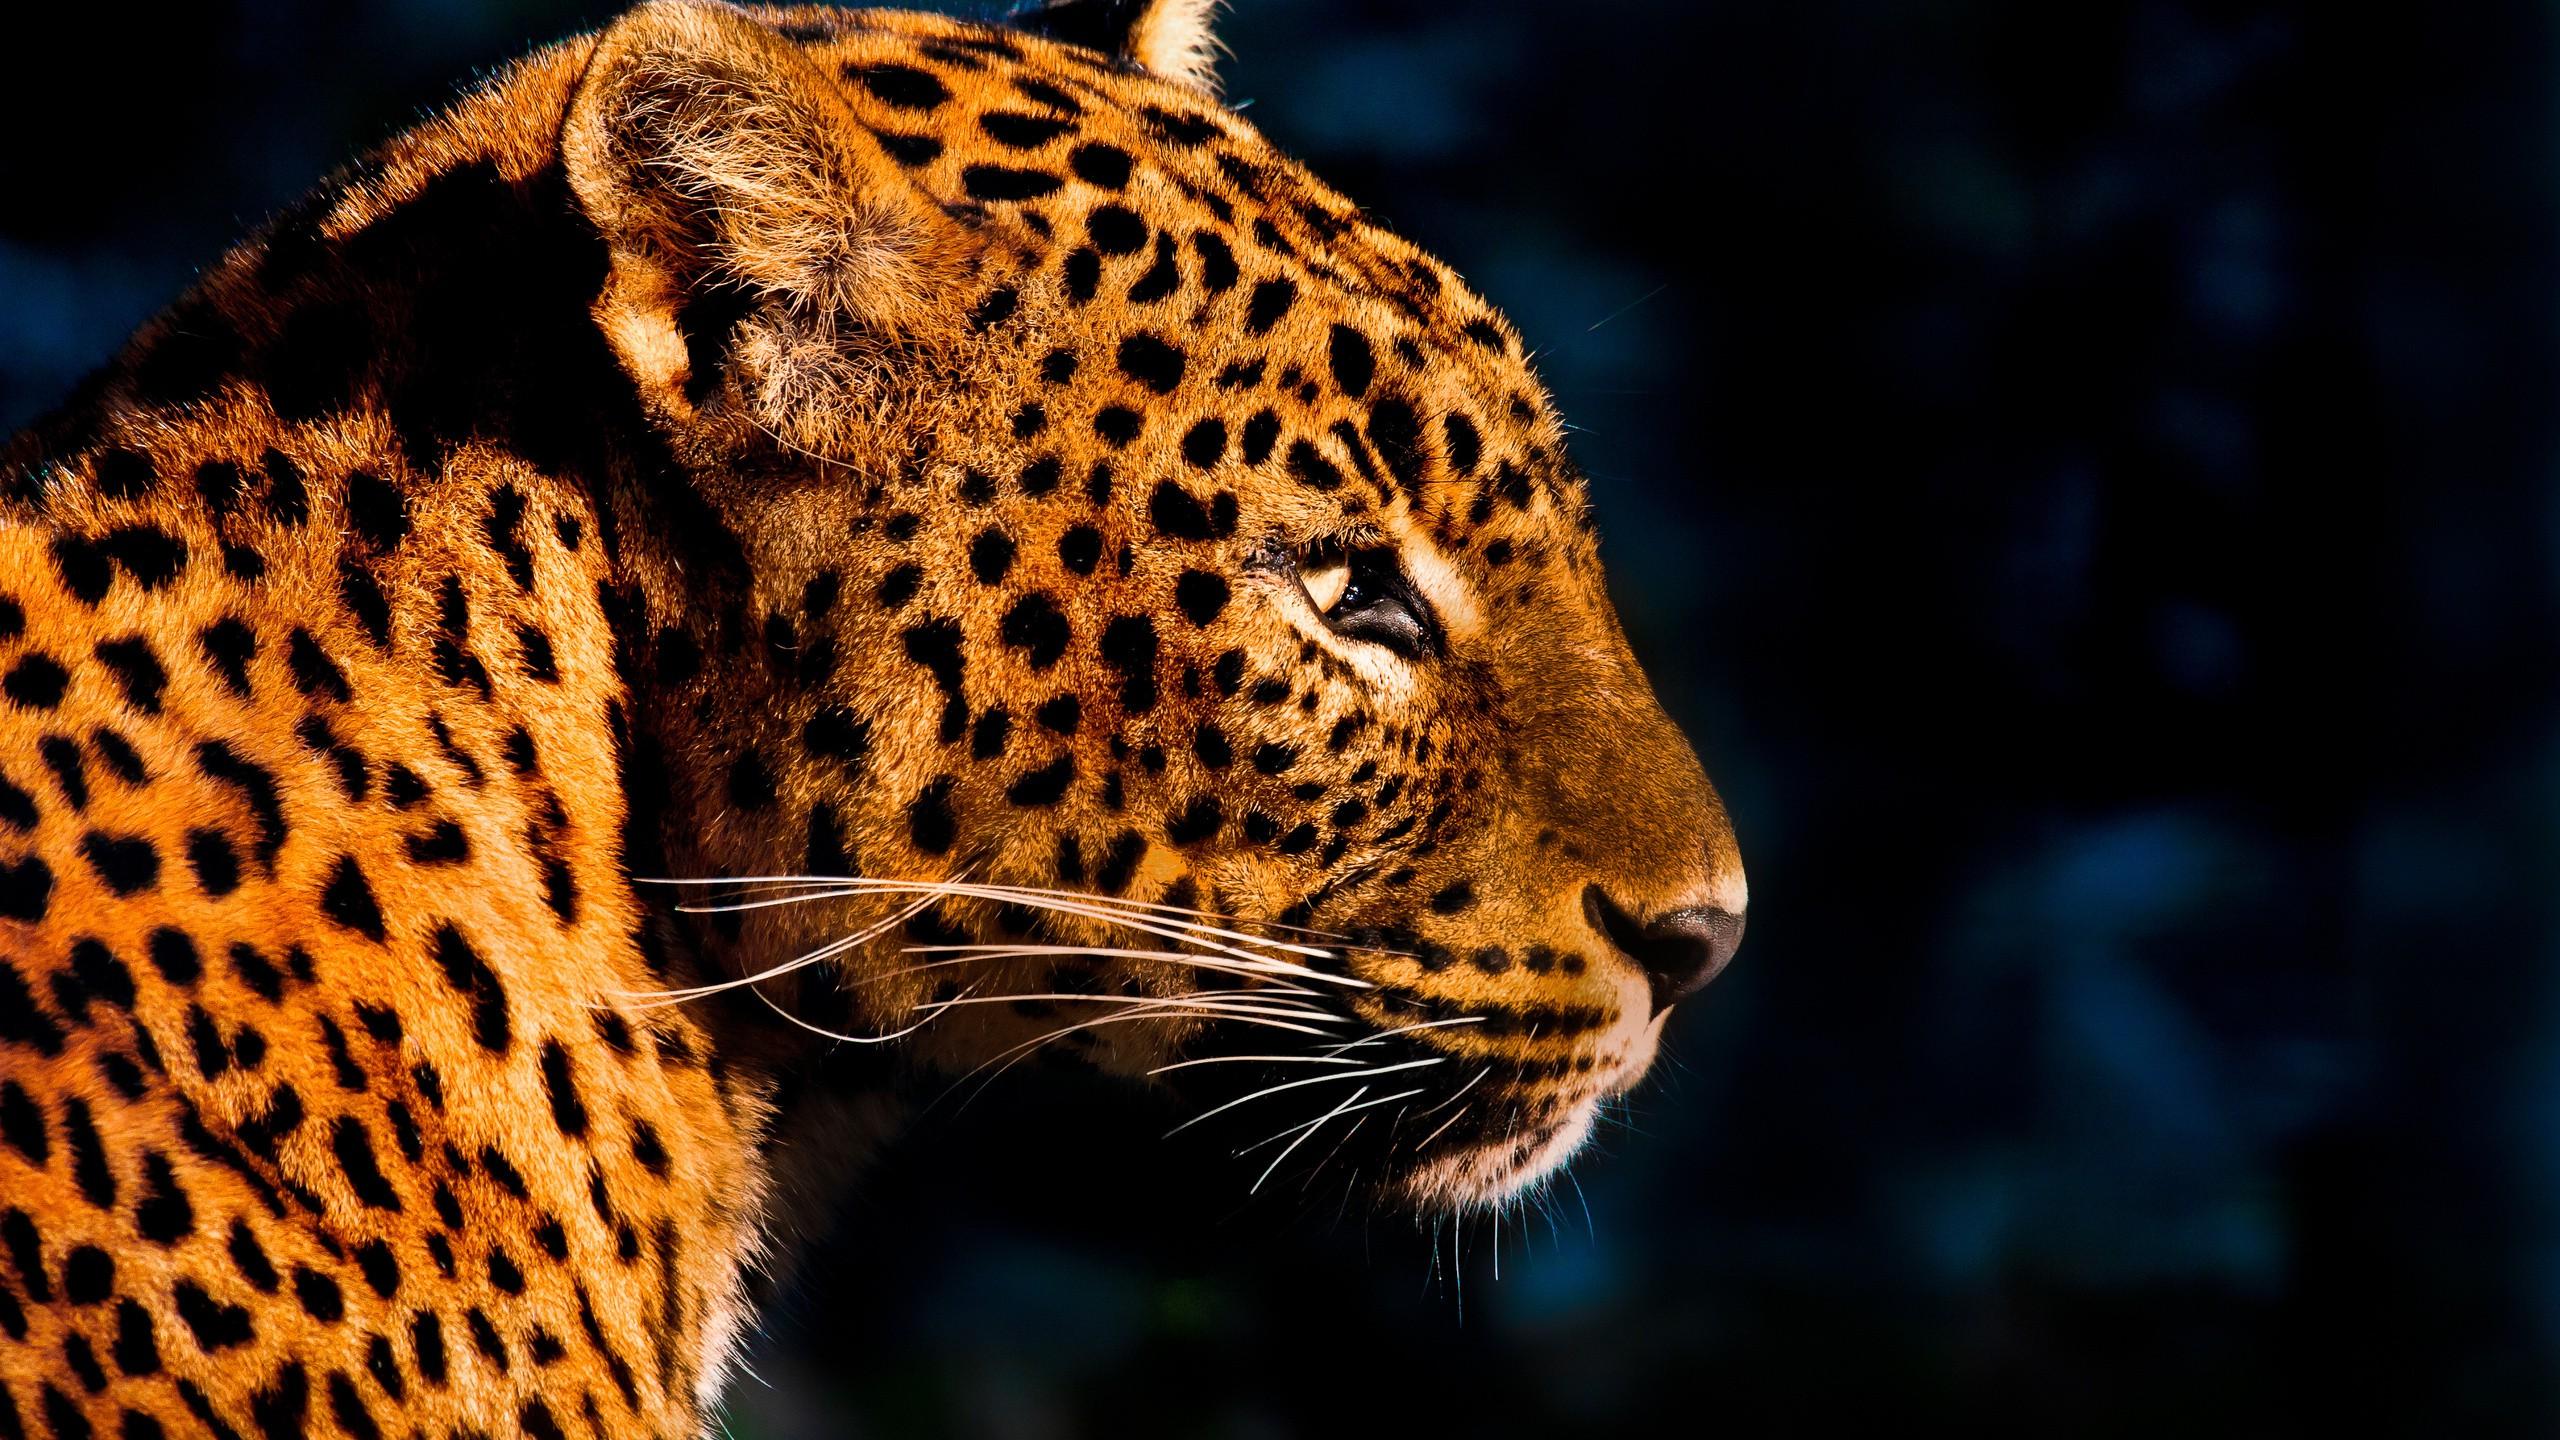 Wallpaper Animals Wildlife Big Cats Whiskers Leopard Jaguar Cheetah 2560x1440 Px Cat Like Mammal Snout Carnivoran Organism Terrestrial Animal 2560x1440 Wallpaperup 771243 Hd Wallpapers Wallhere